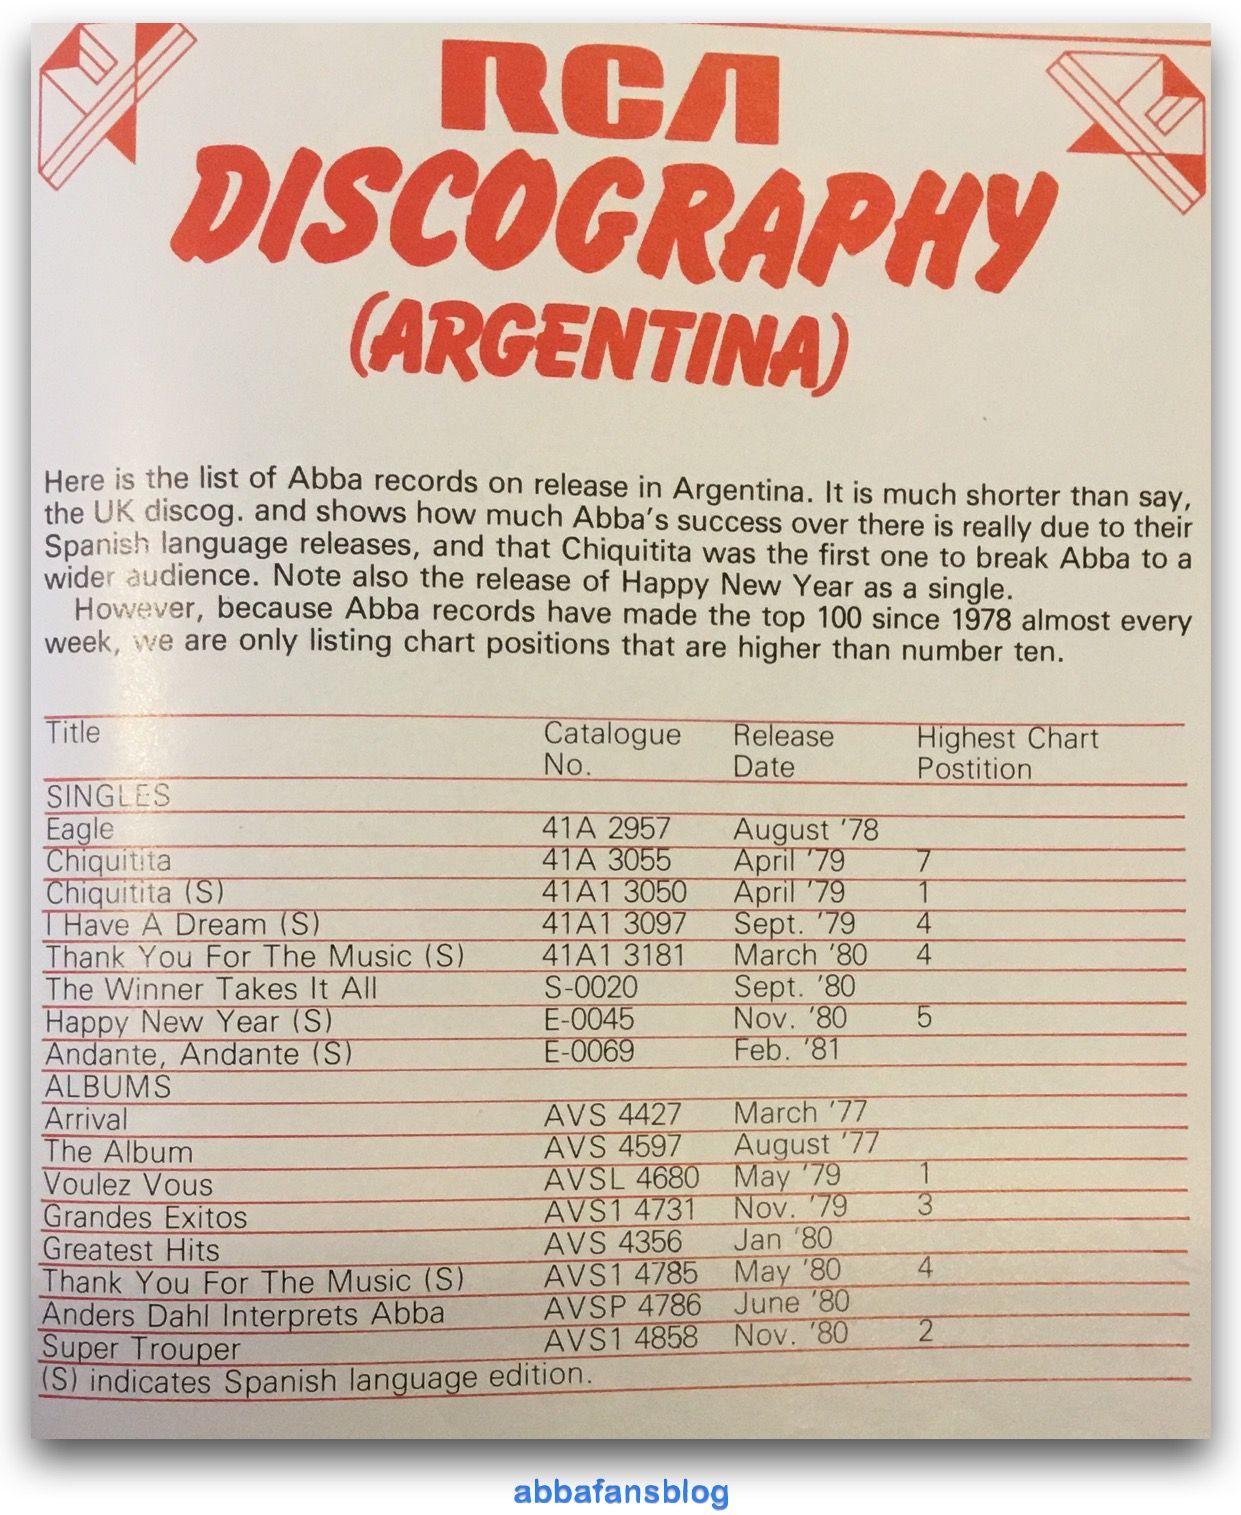 ABBA Fans Blog: Abba Discography From Argentina #Abba #Agnetha #Frida http://abbafansblog.blogspot.co.uk/2016/01/abba-discography-from-argentina.html